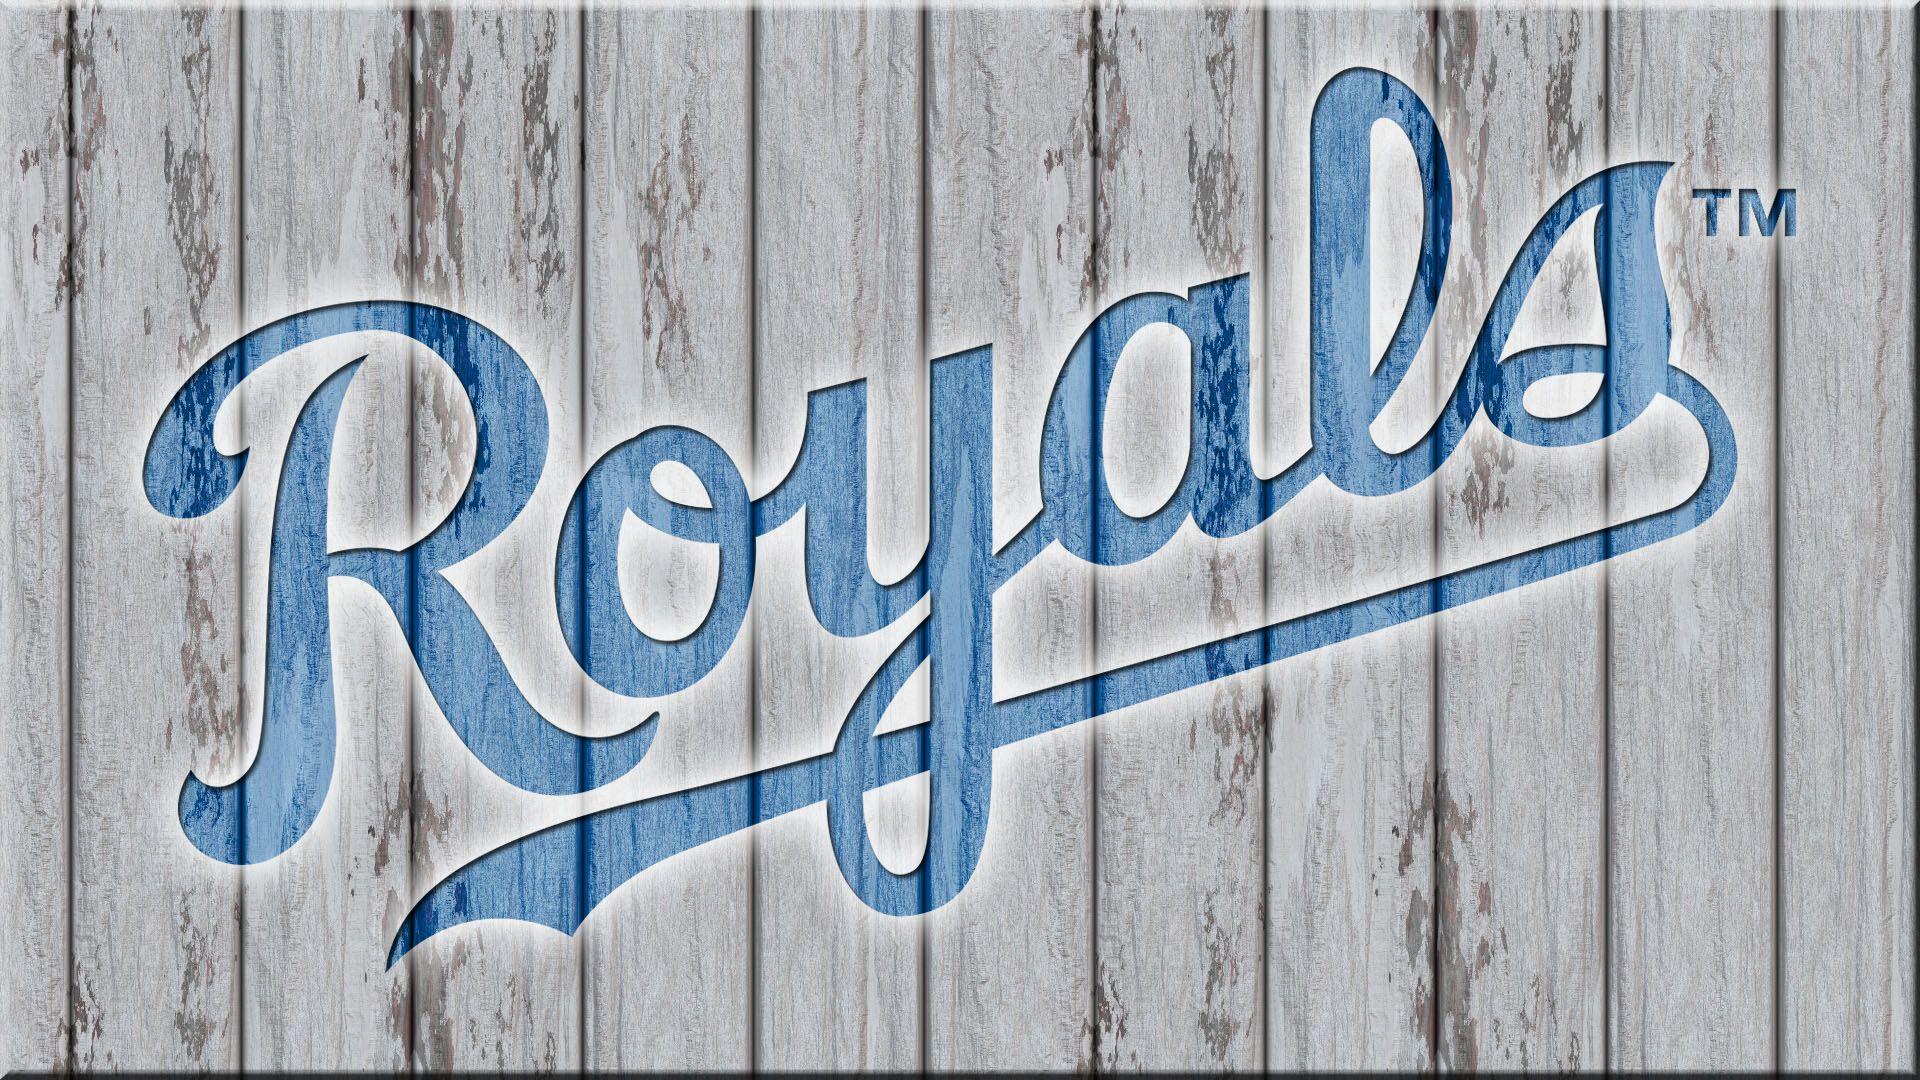 kansas city royals wallpaper free desktop 8 hd wallpapers